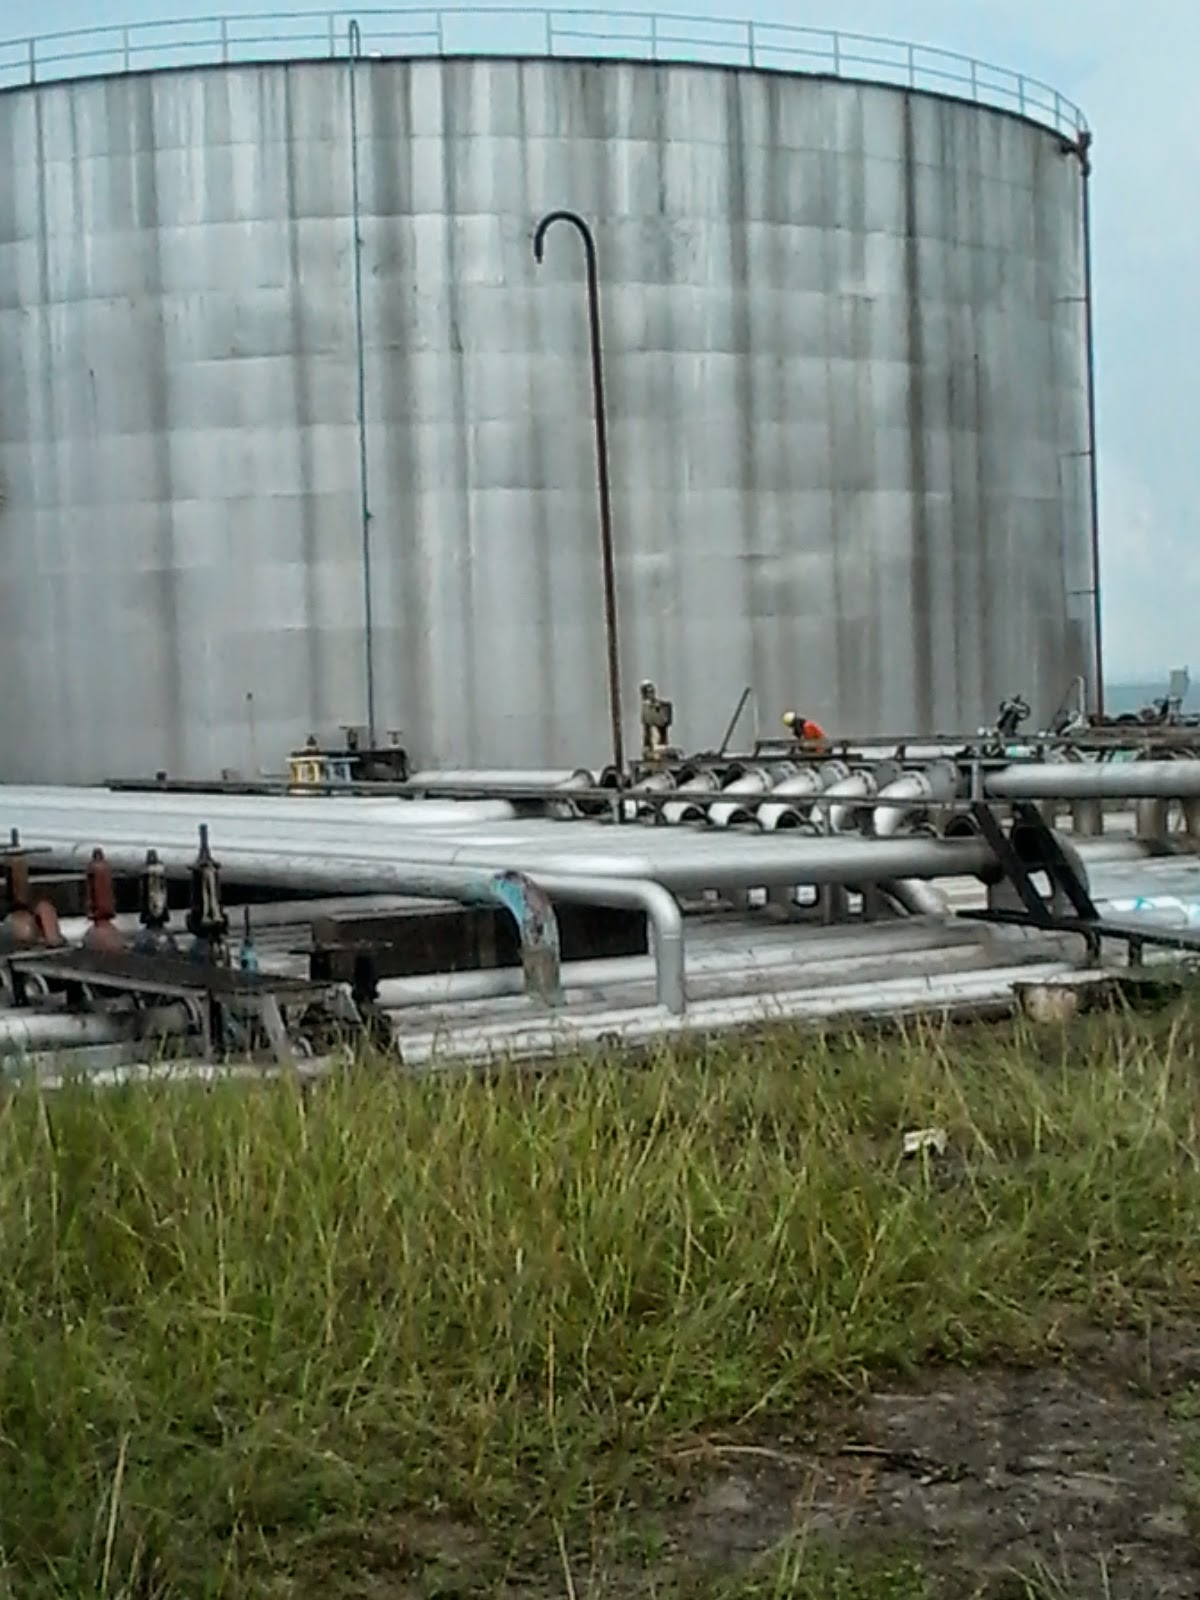 lokasi pemotongan pipa minyak